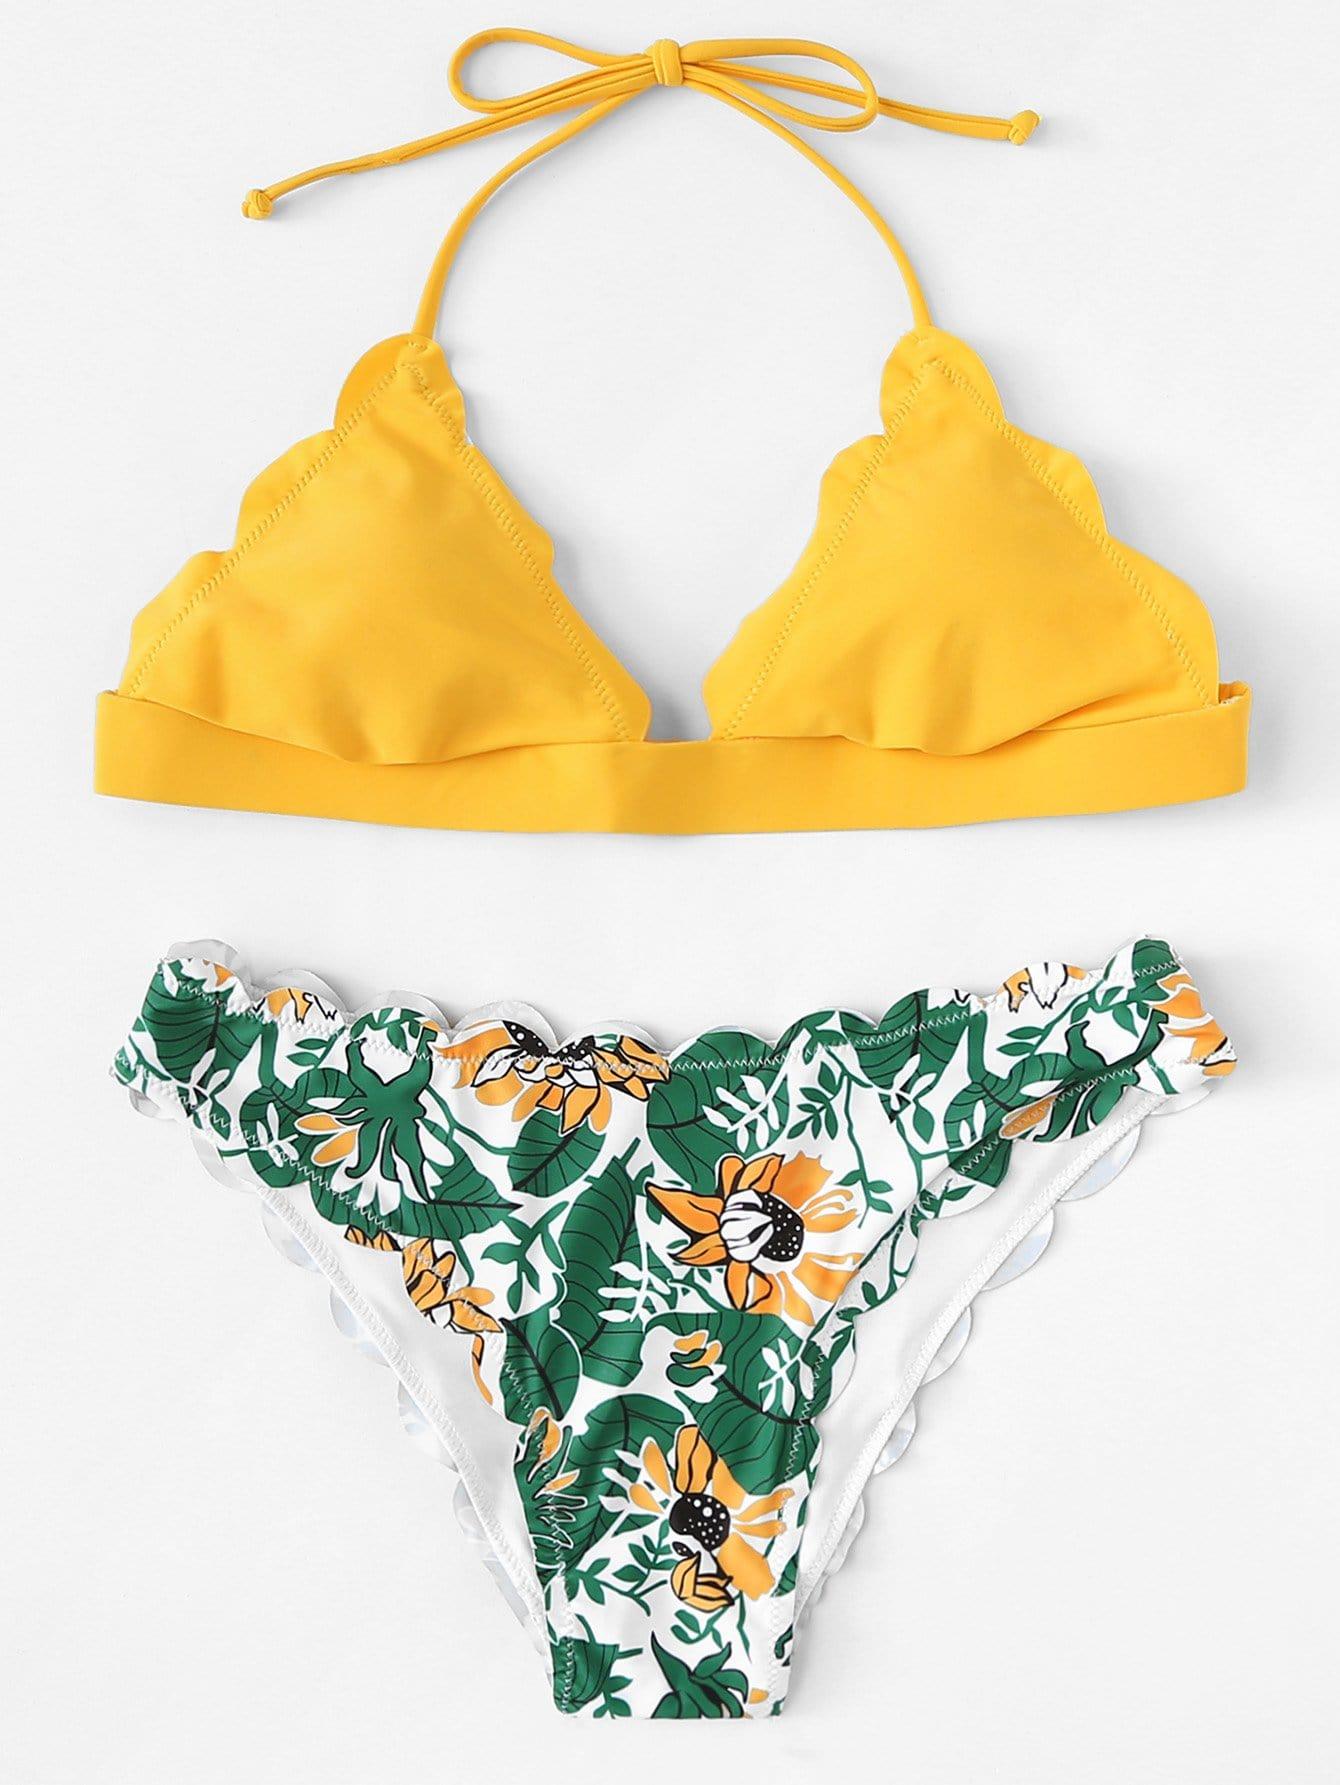 Купить Scalloped Edge Mix и Match Bikini Set, null, SheIn